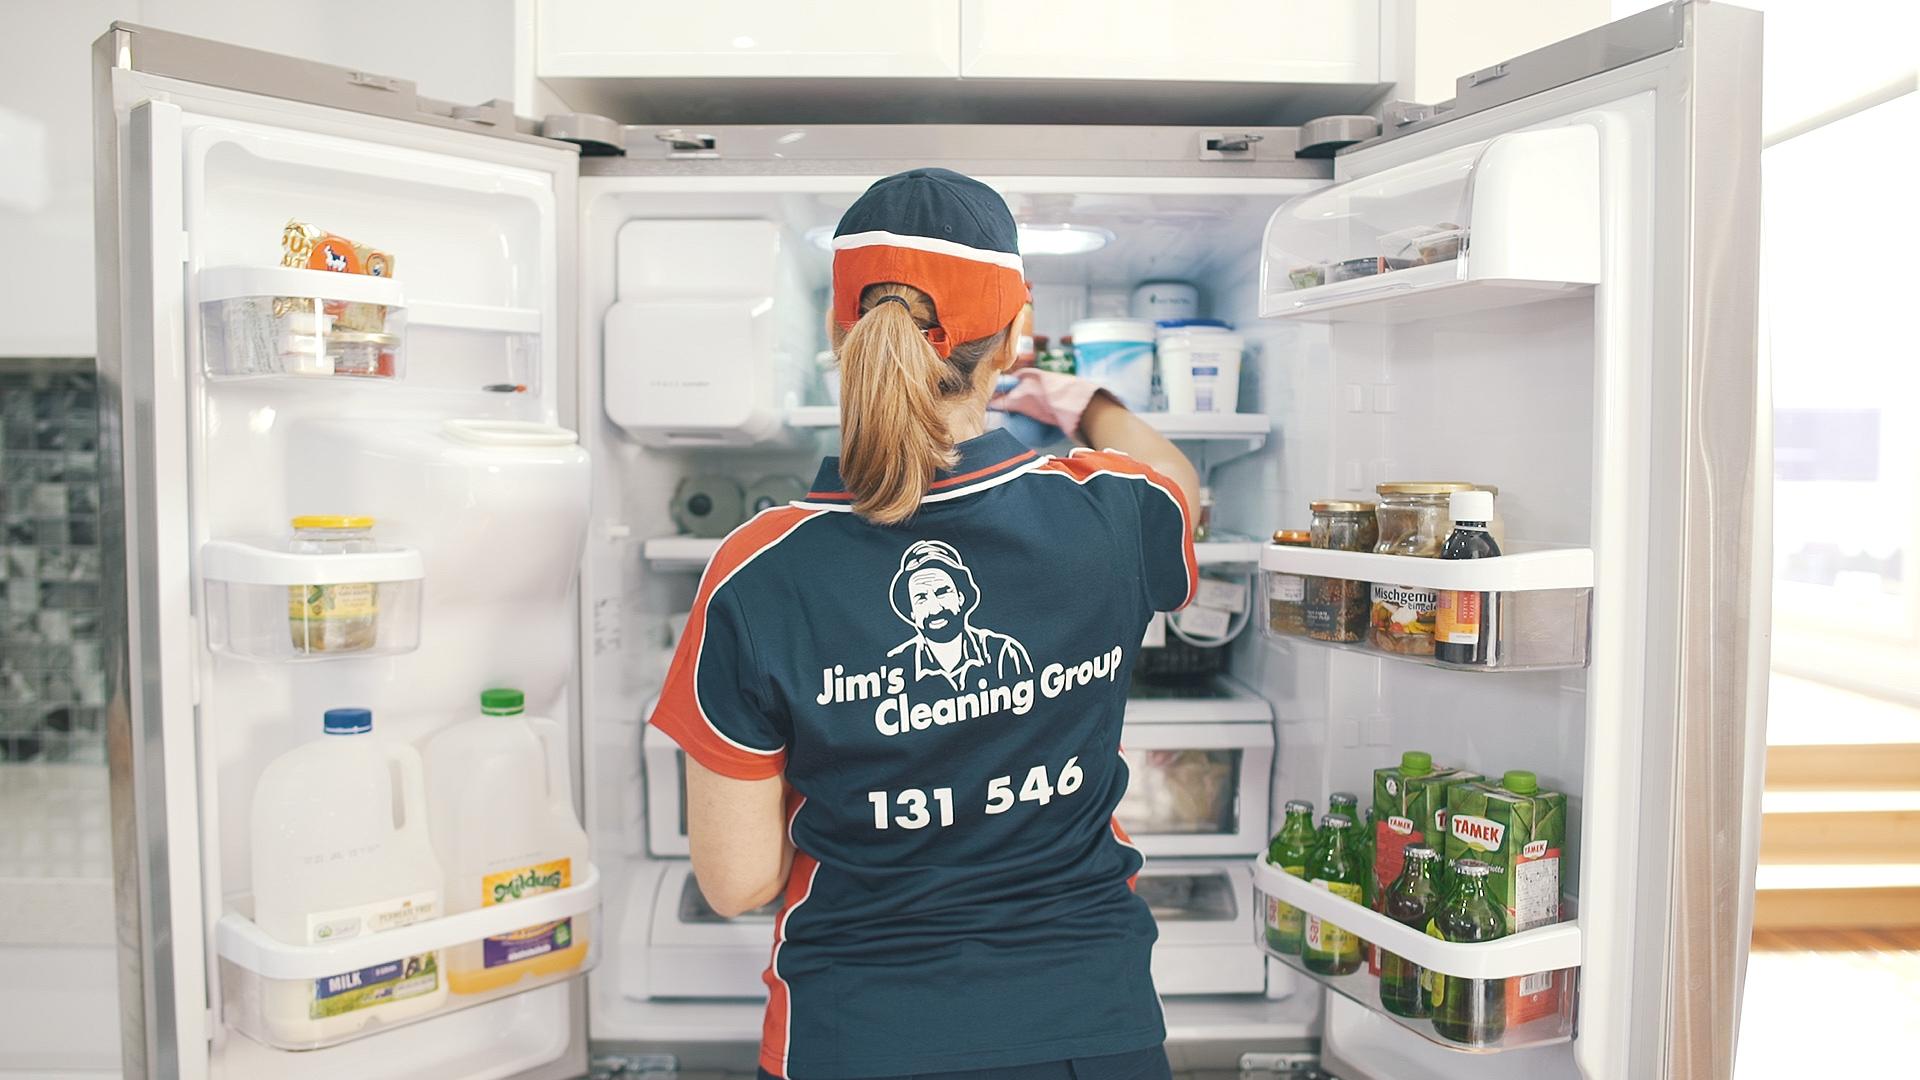 Jim's Cleaning Baulkham Hills - North Parramatta, NSW 2151 - (01) 3154 1546   ShowMeLocal.com